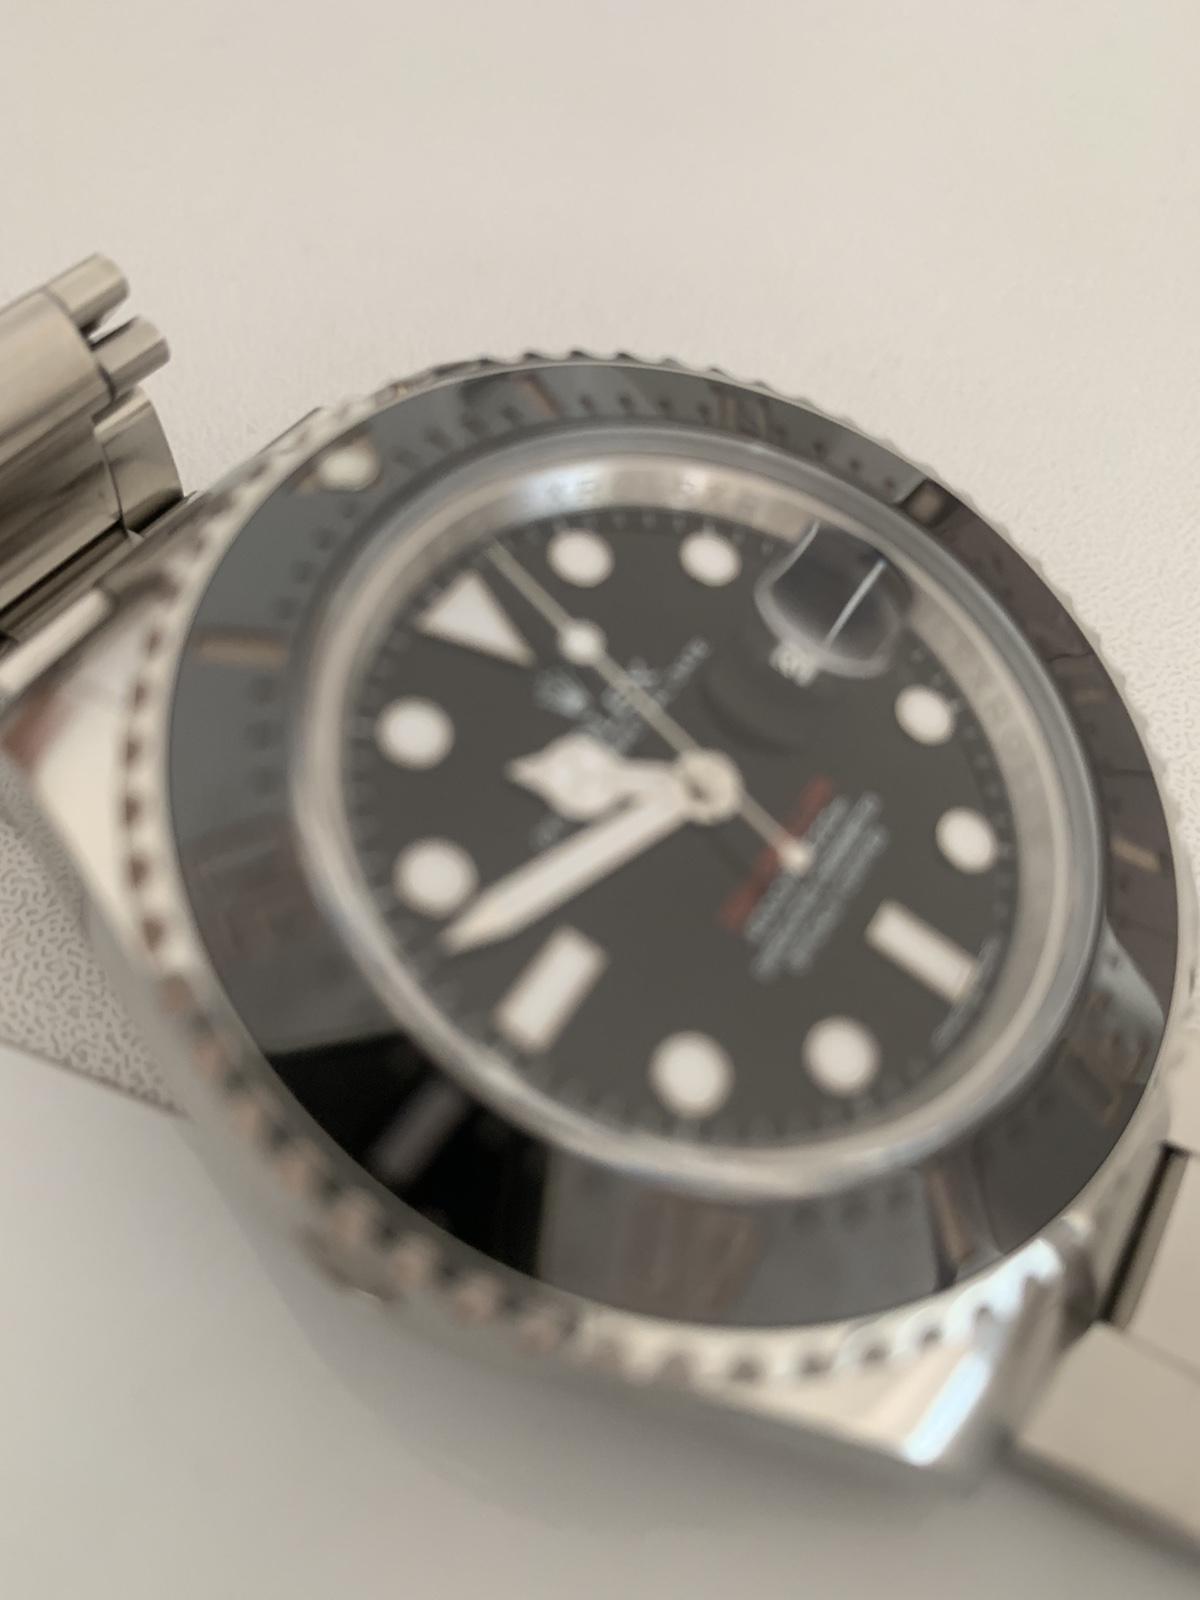 Rolex Sea-Dweller 126600 VS ARF Replica - σύγκριση δίπλα-δίπλα - Ρολόγια Replica